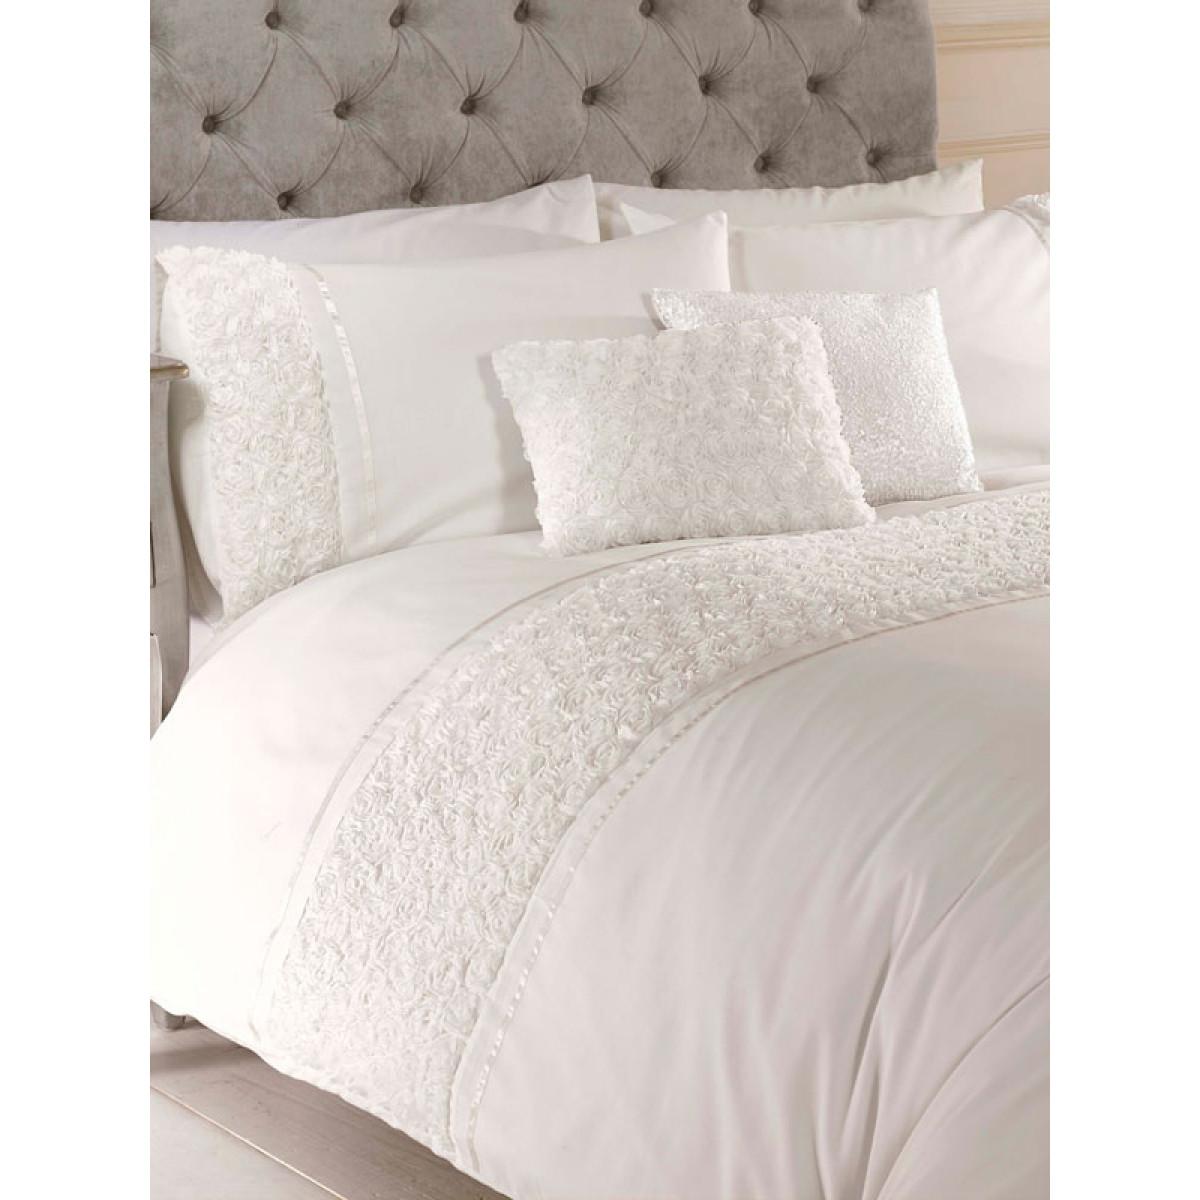 969c7bce32d1 Limoges Rose Ruffle Cream King Size Duvet Cover and Pillowcase Set